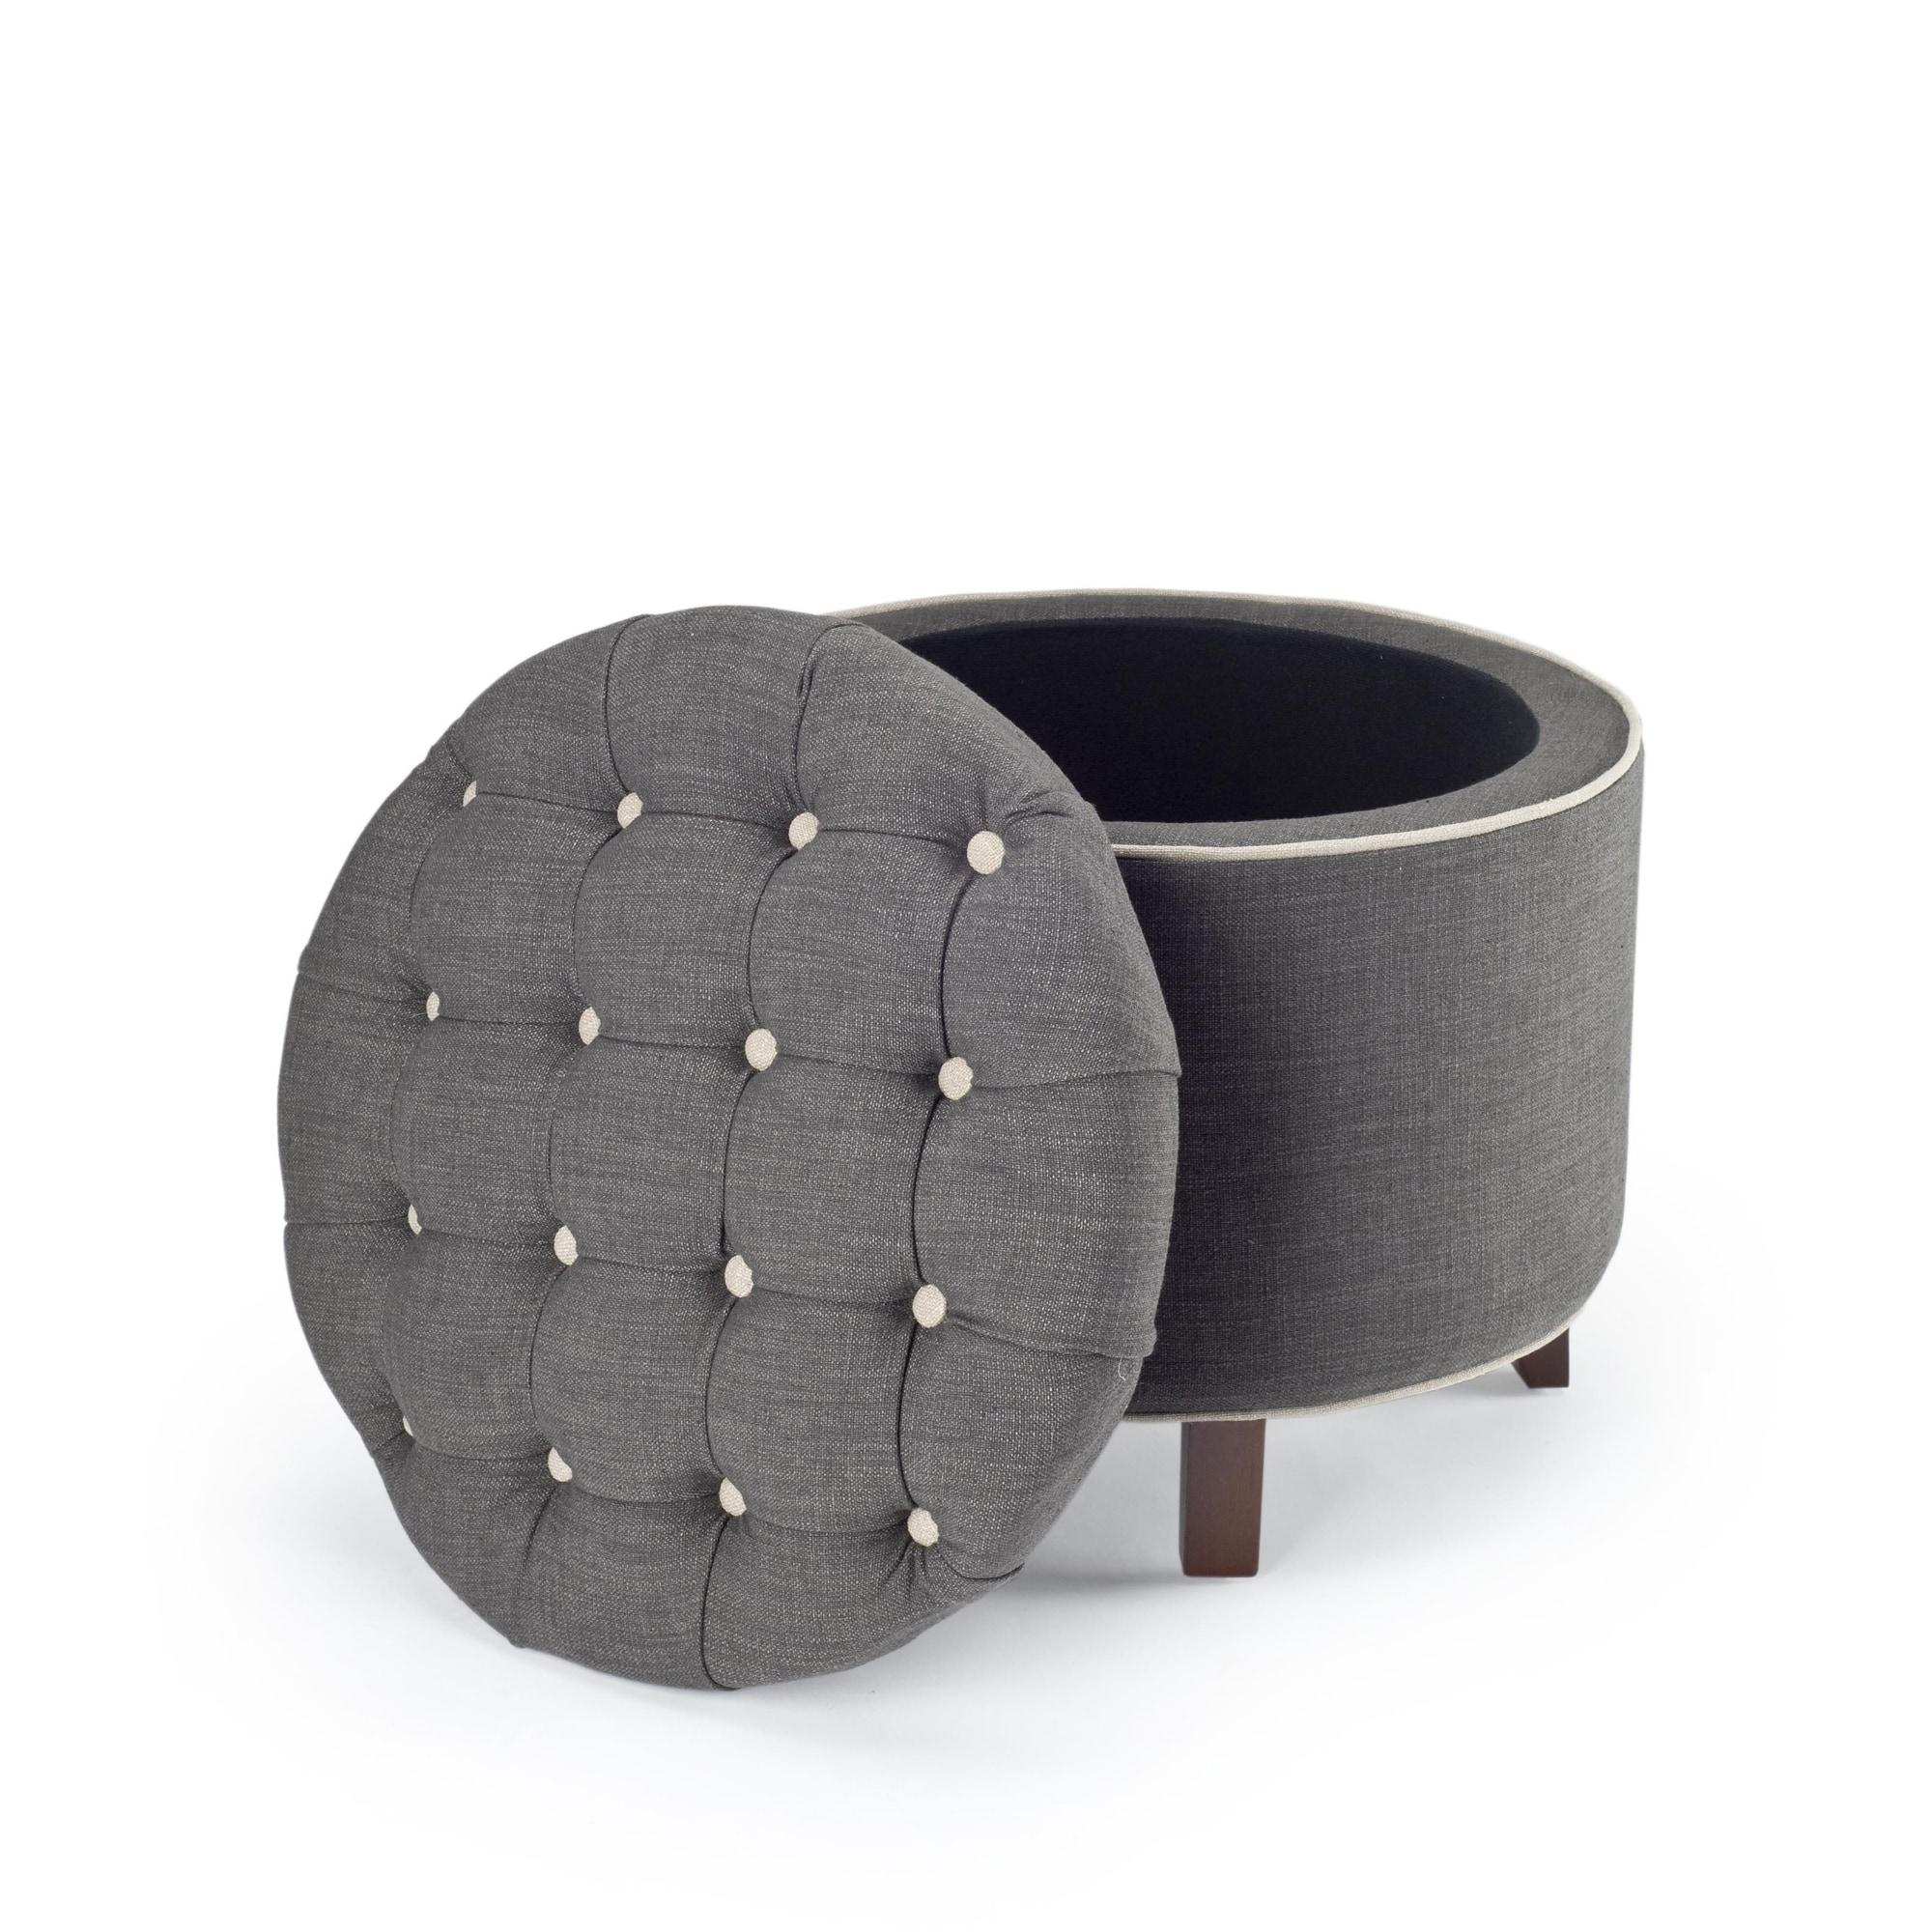 Shop safavieh reims grey storage ottoman free shipping today overstock com 4757236